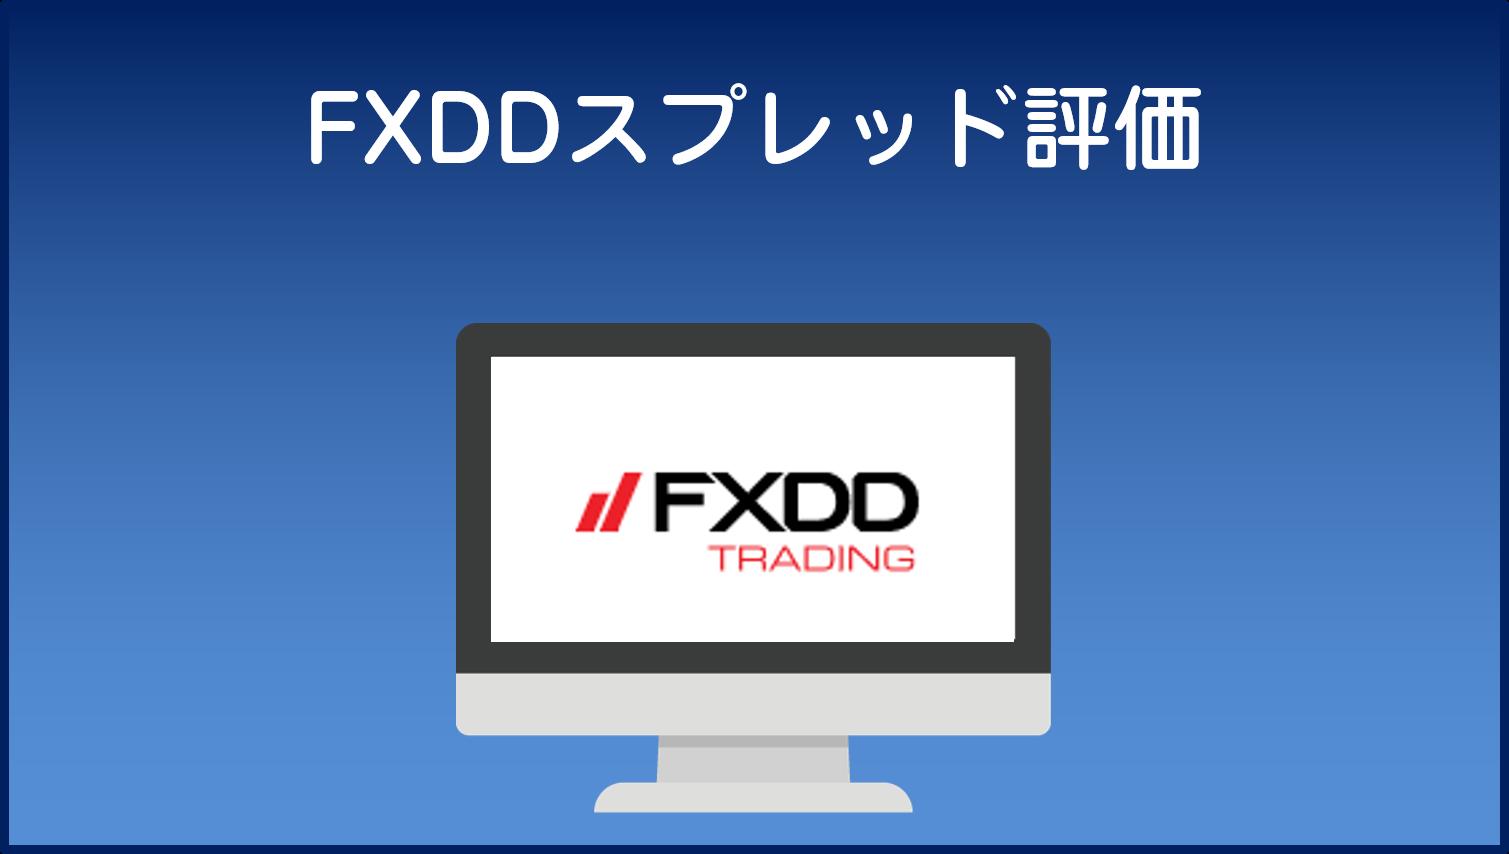 FXDDスプレッド評価